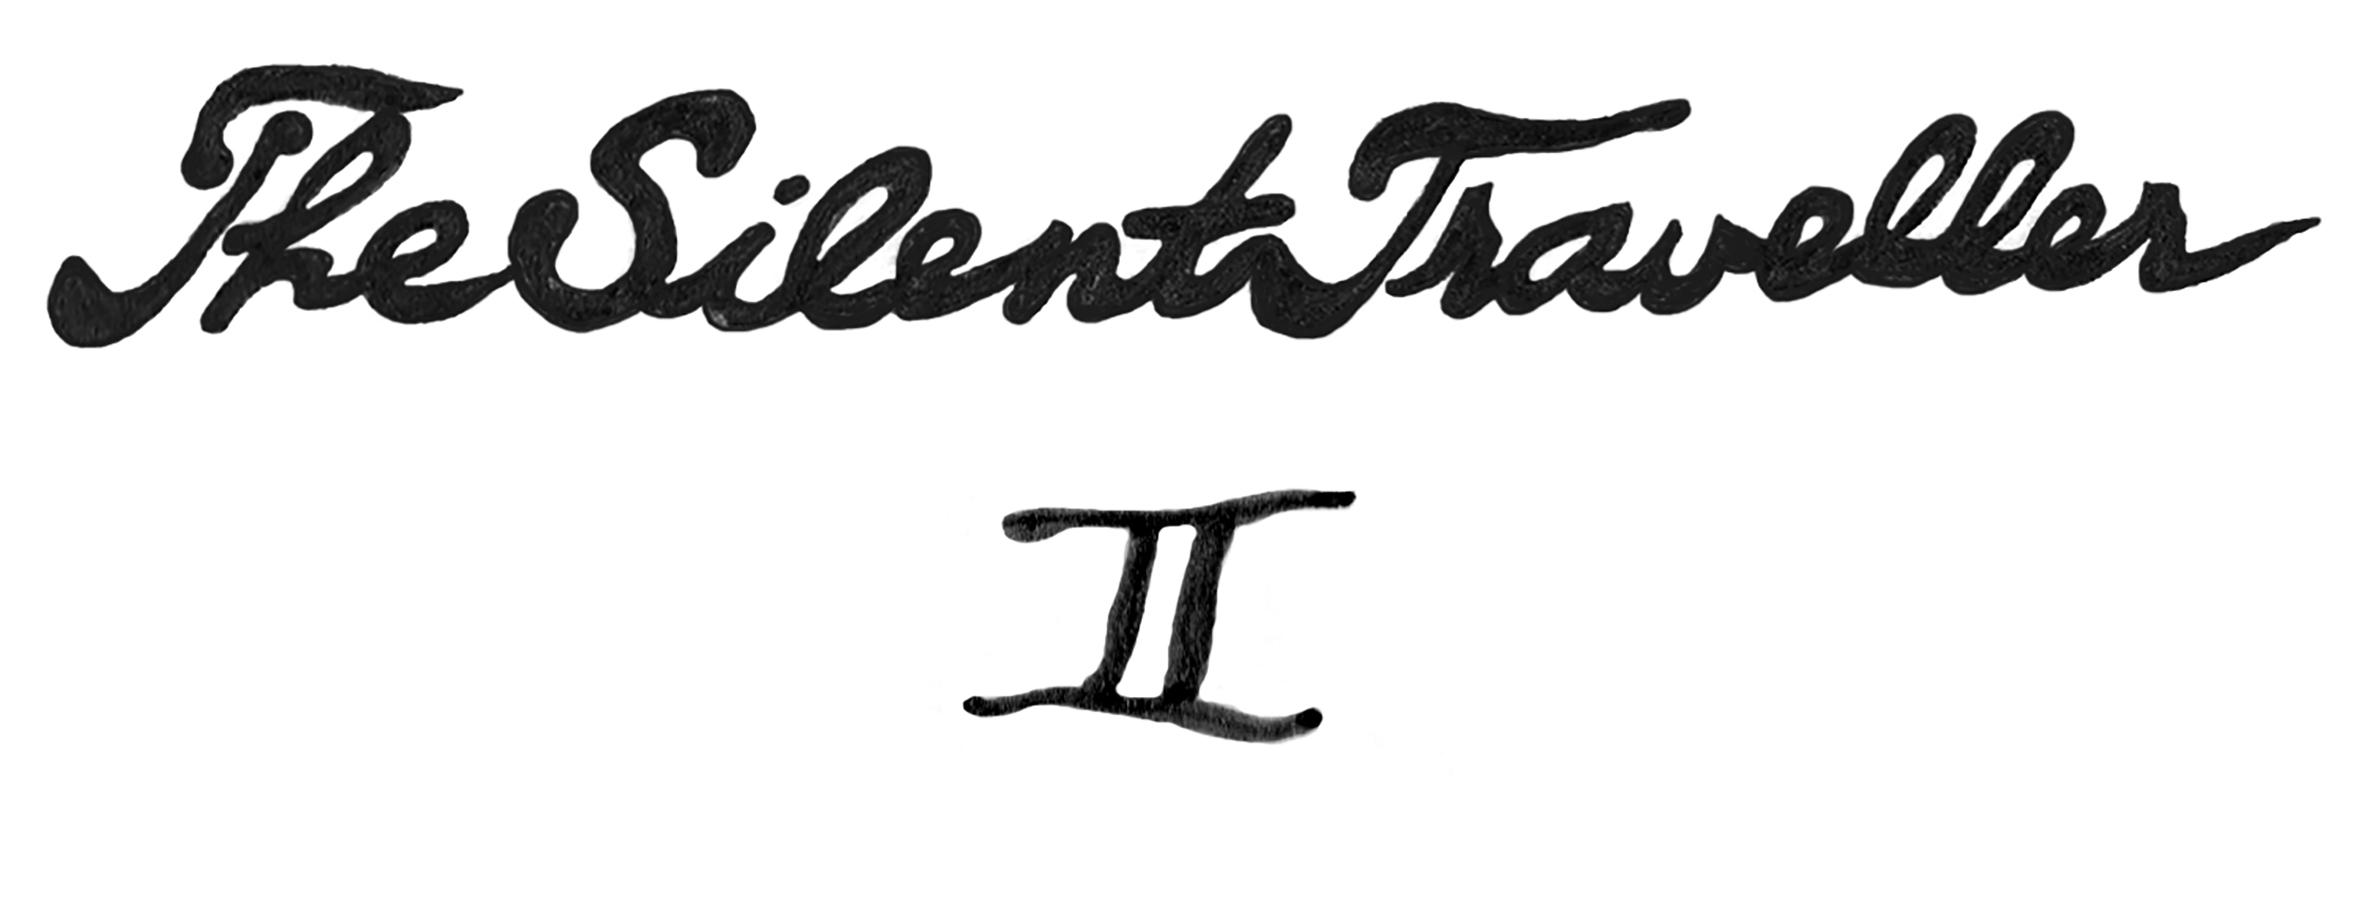 TST Label II_Numerals_Final.jpg